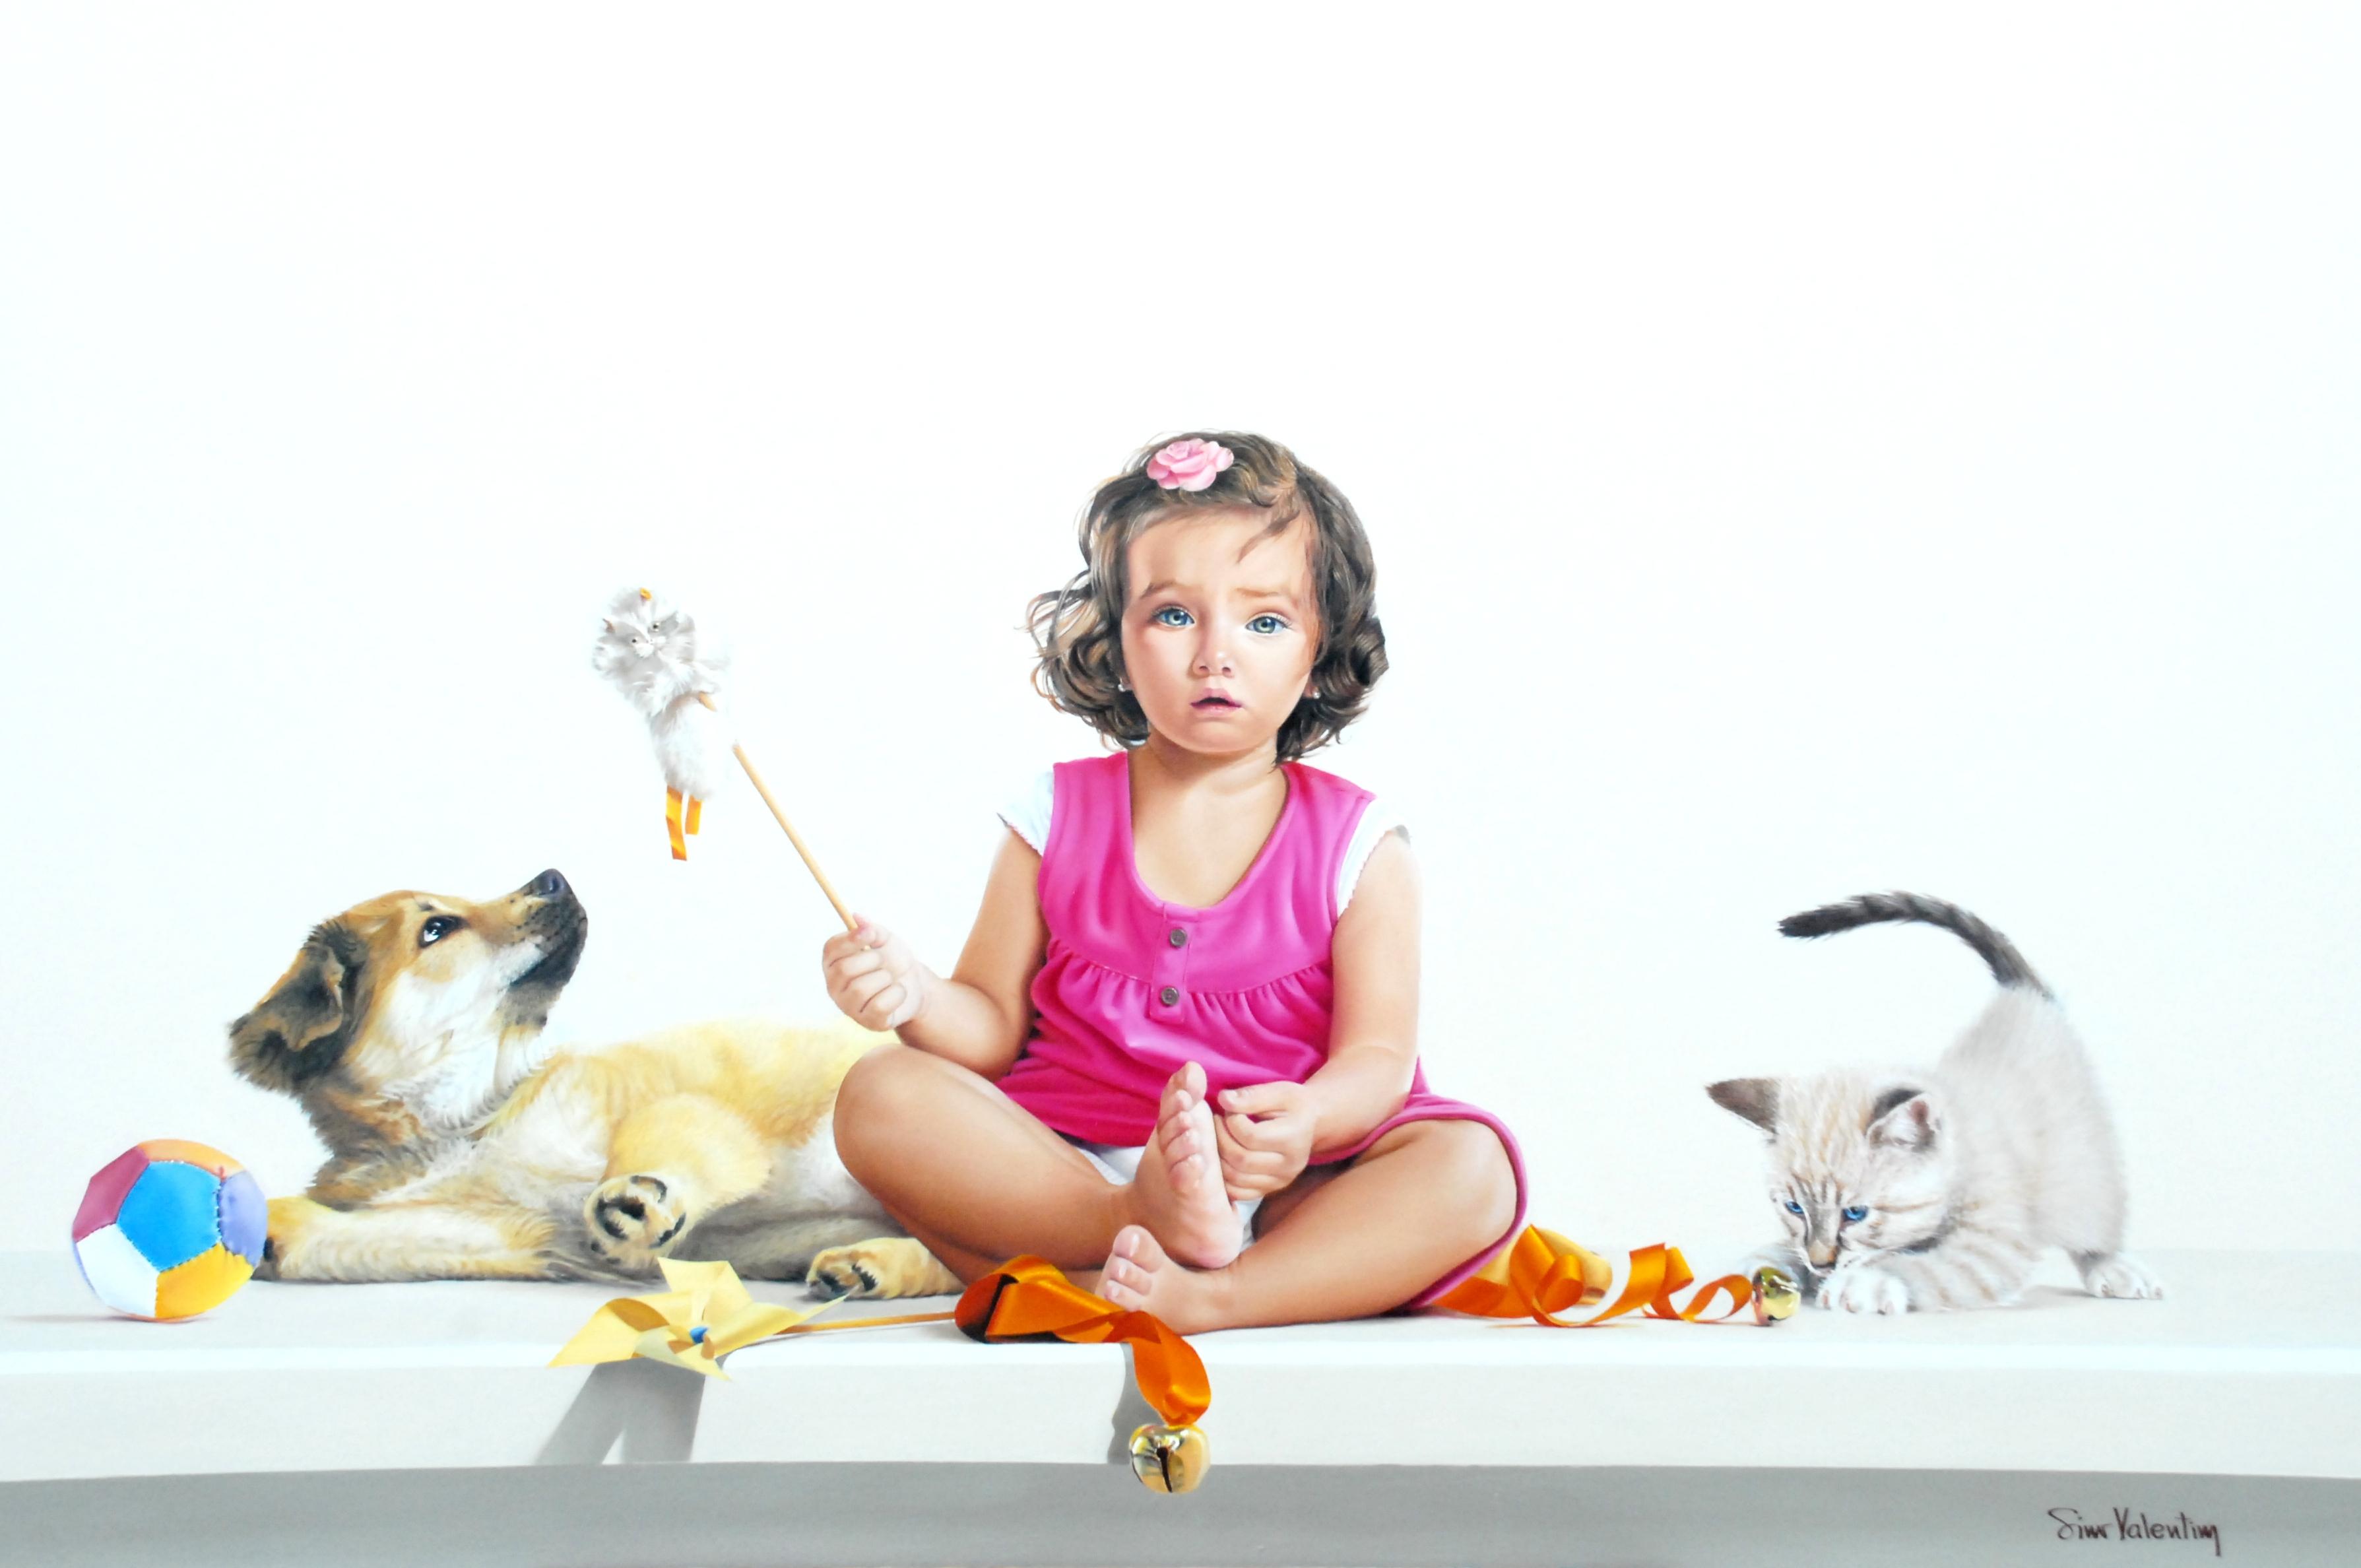 A Menina e os Filhotes